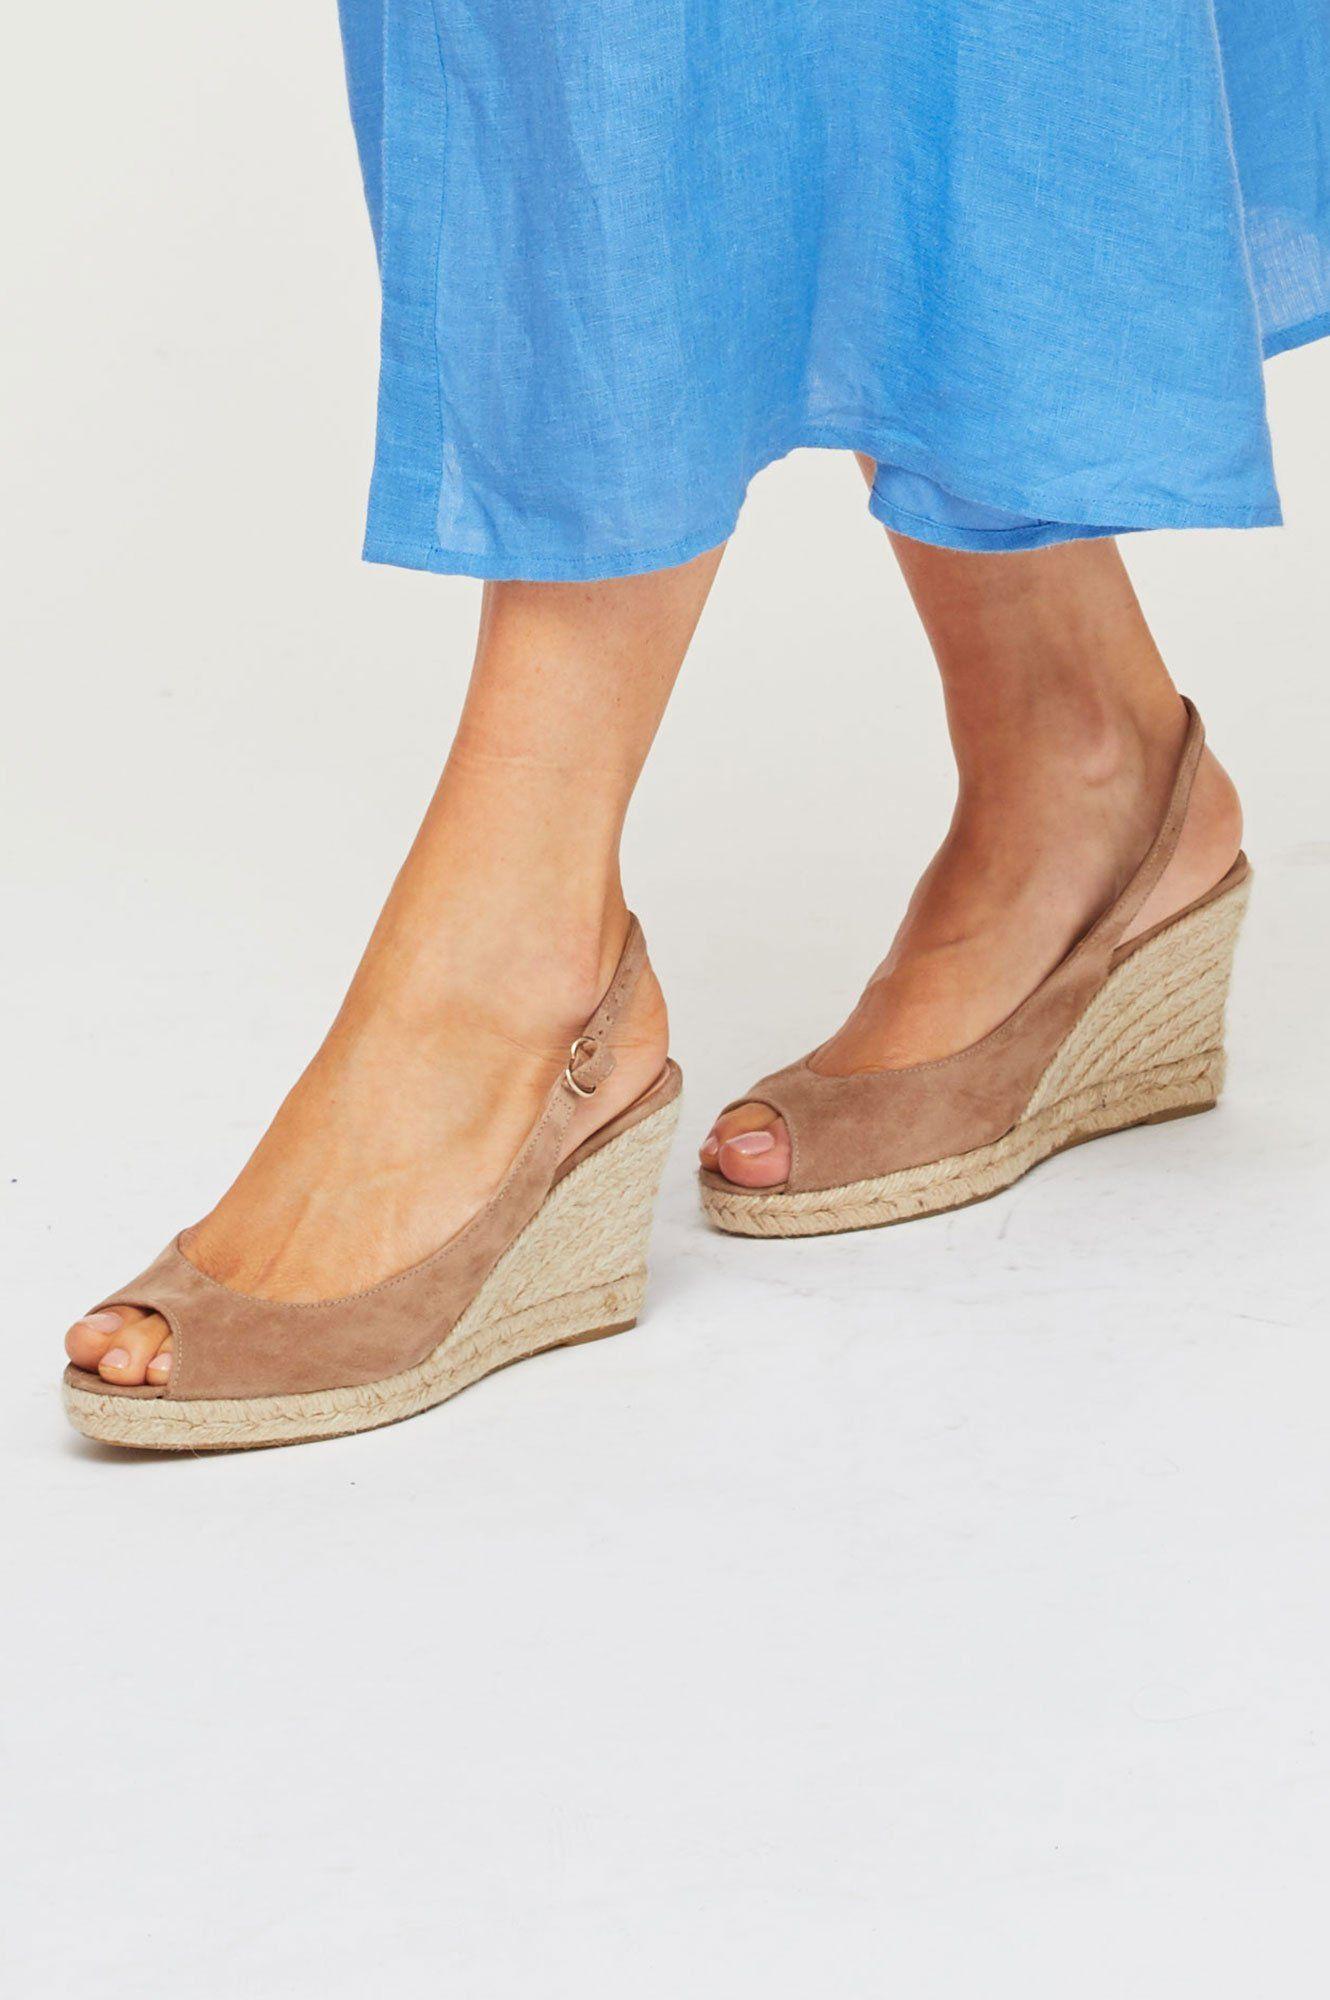 4068cfb0b9d Mykonos Peep Toe Espadrilles   Almond in 2019   Summer clothes ...